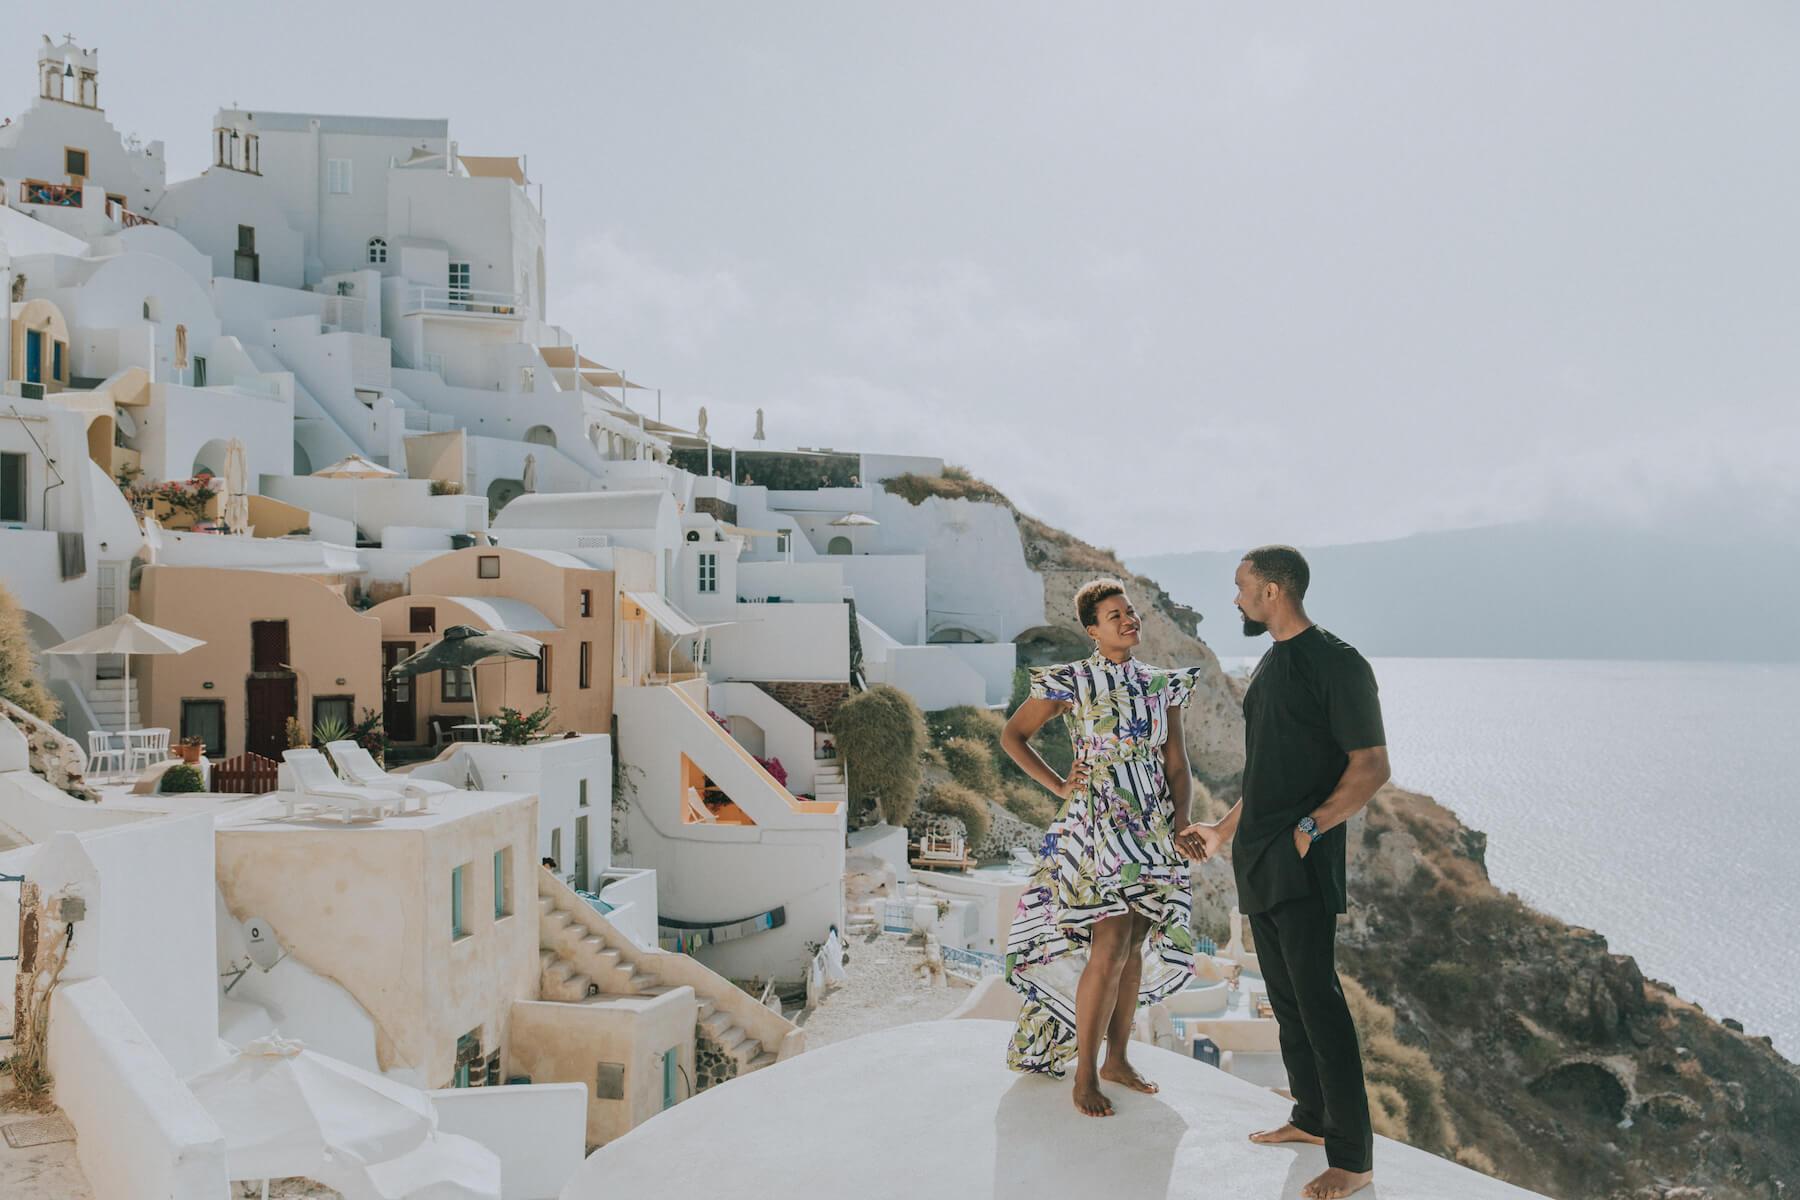 santorini-09-24-2019-couples-trip-17_original